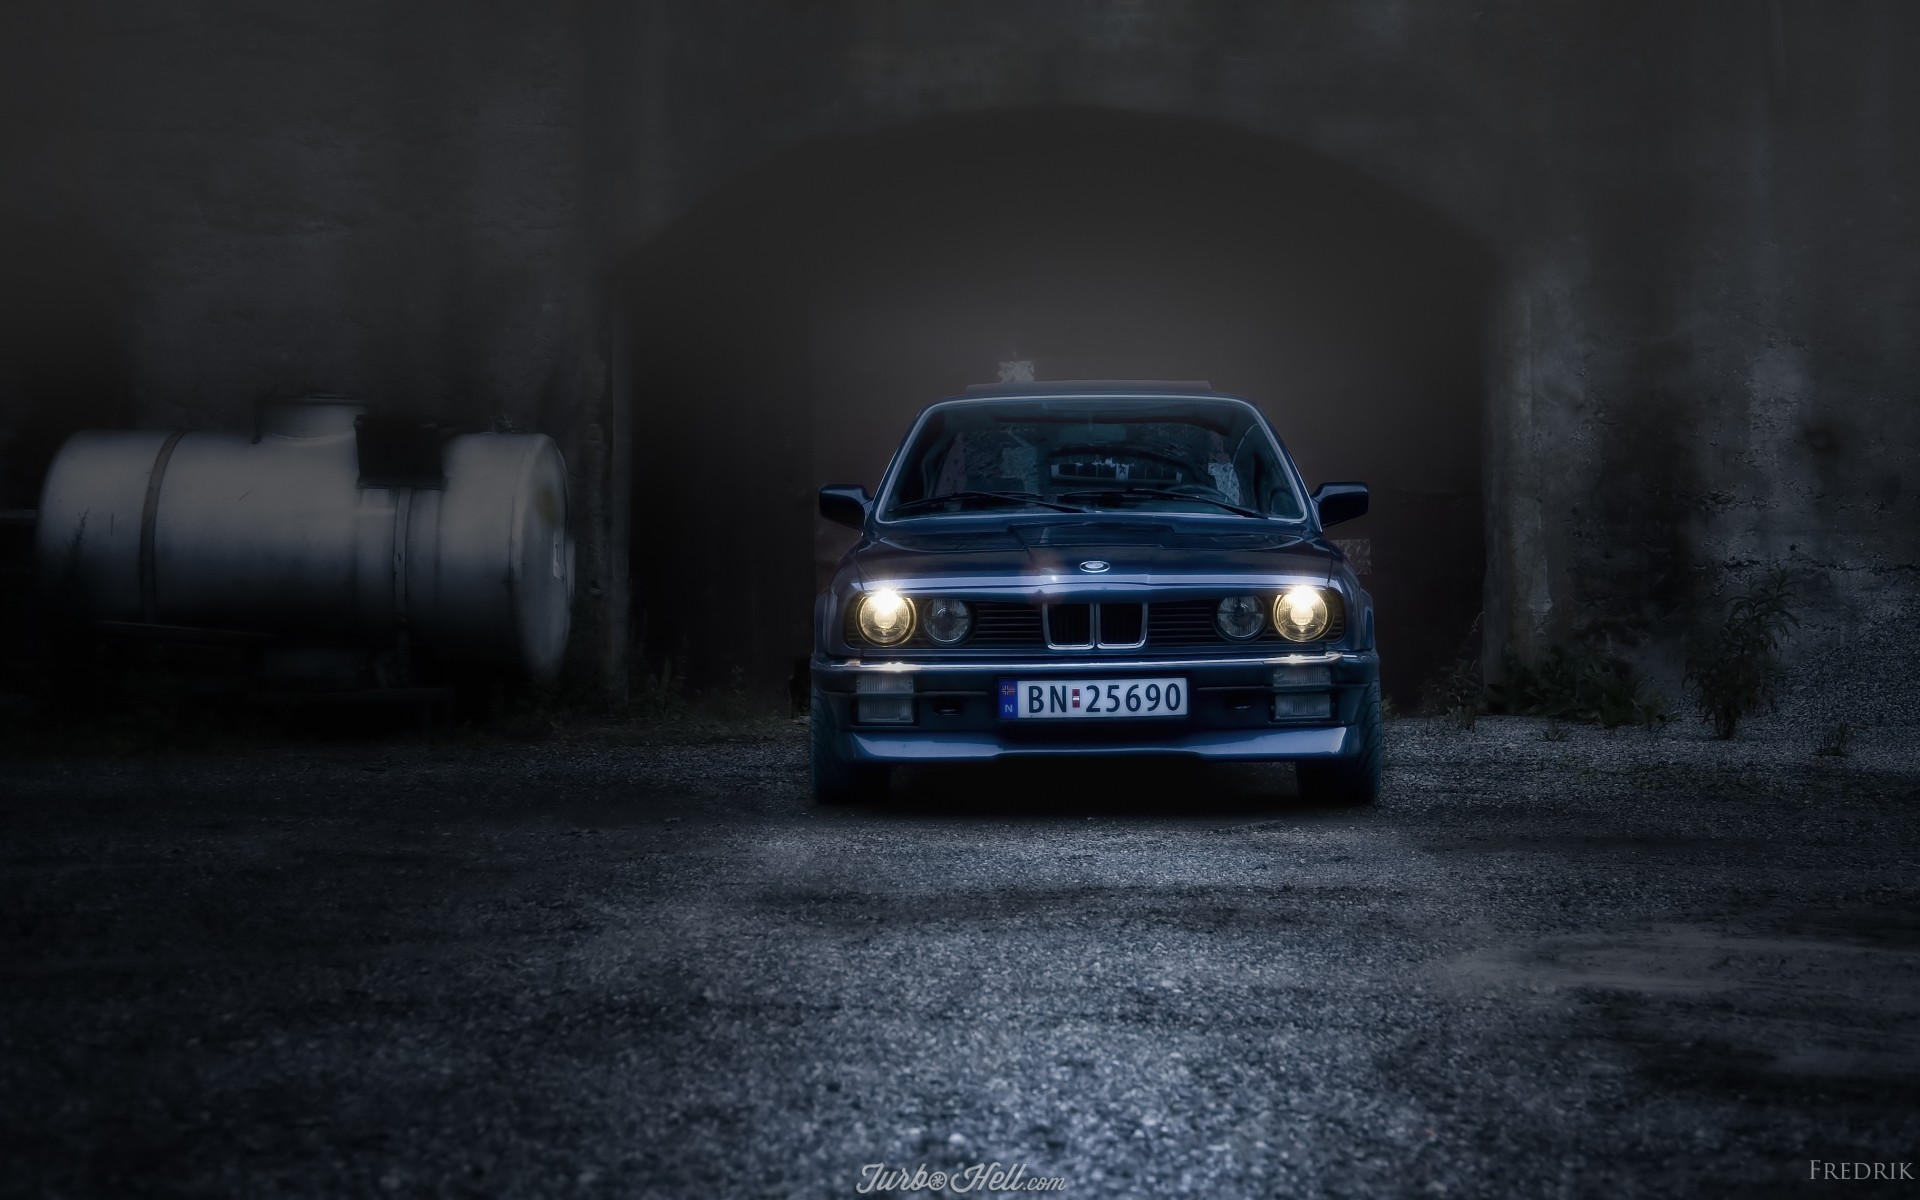 1080x1920 BMW M Logo iPhone Wallpaper | Bimmer | Pinterest | BMW, Cars and .